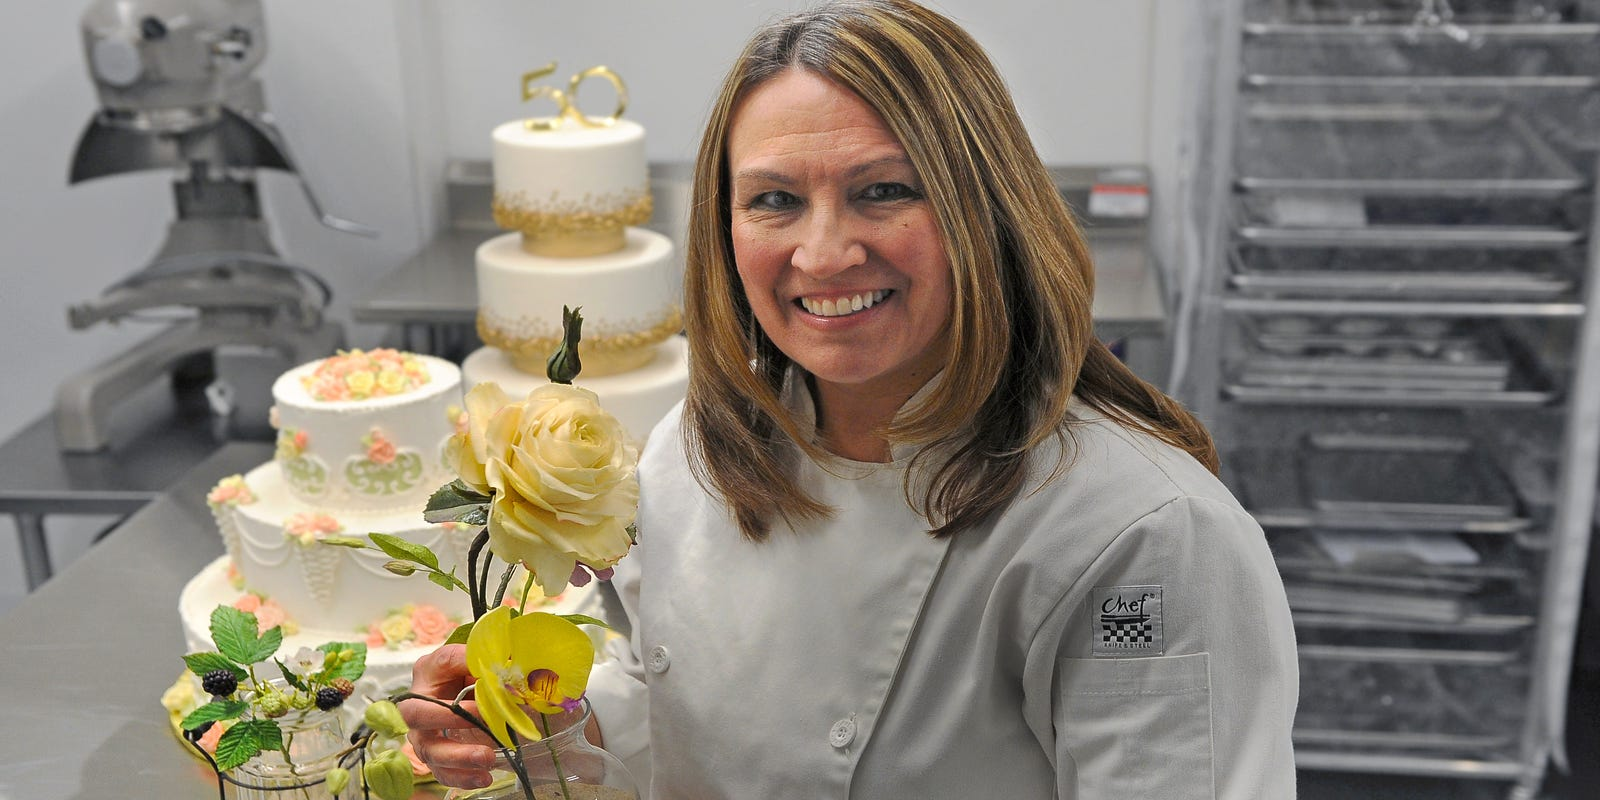 Joann Fabrics Cake Decorating Class  from www.gannett-cdn.com